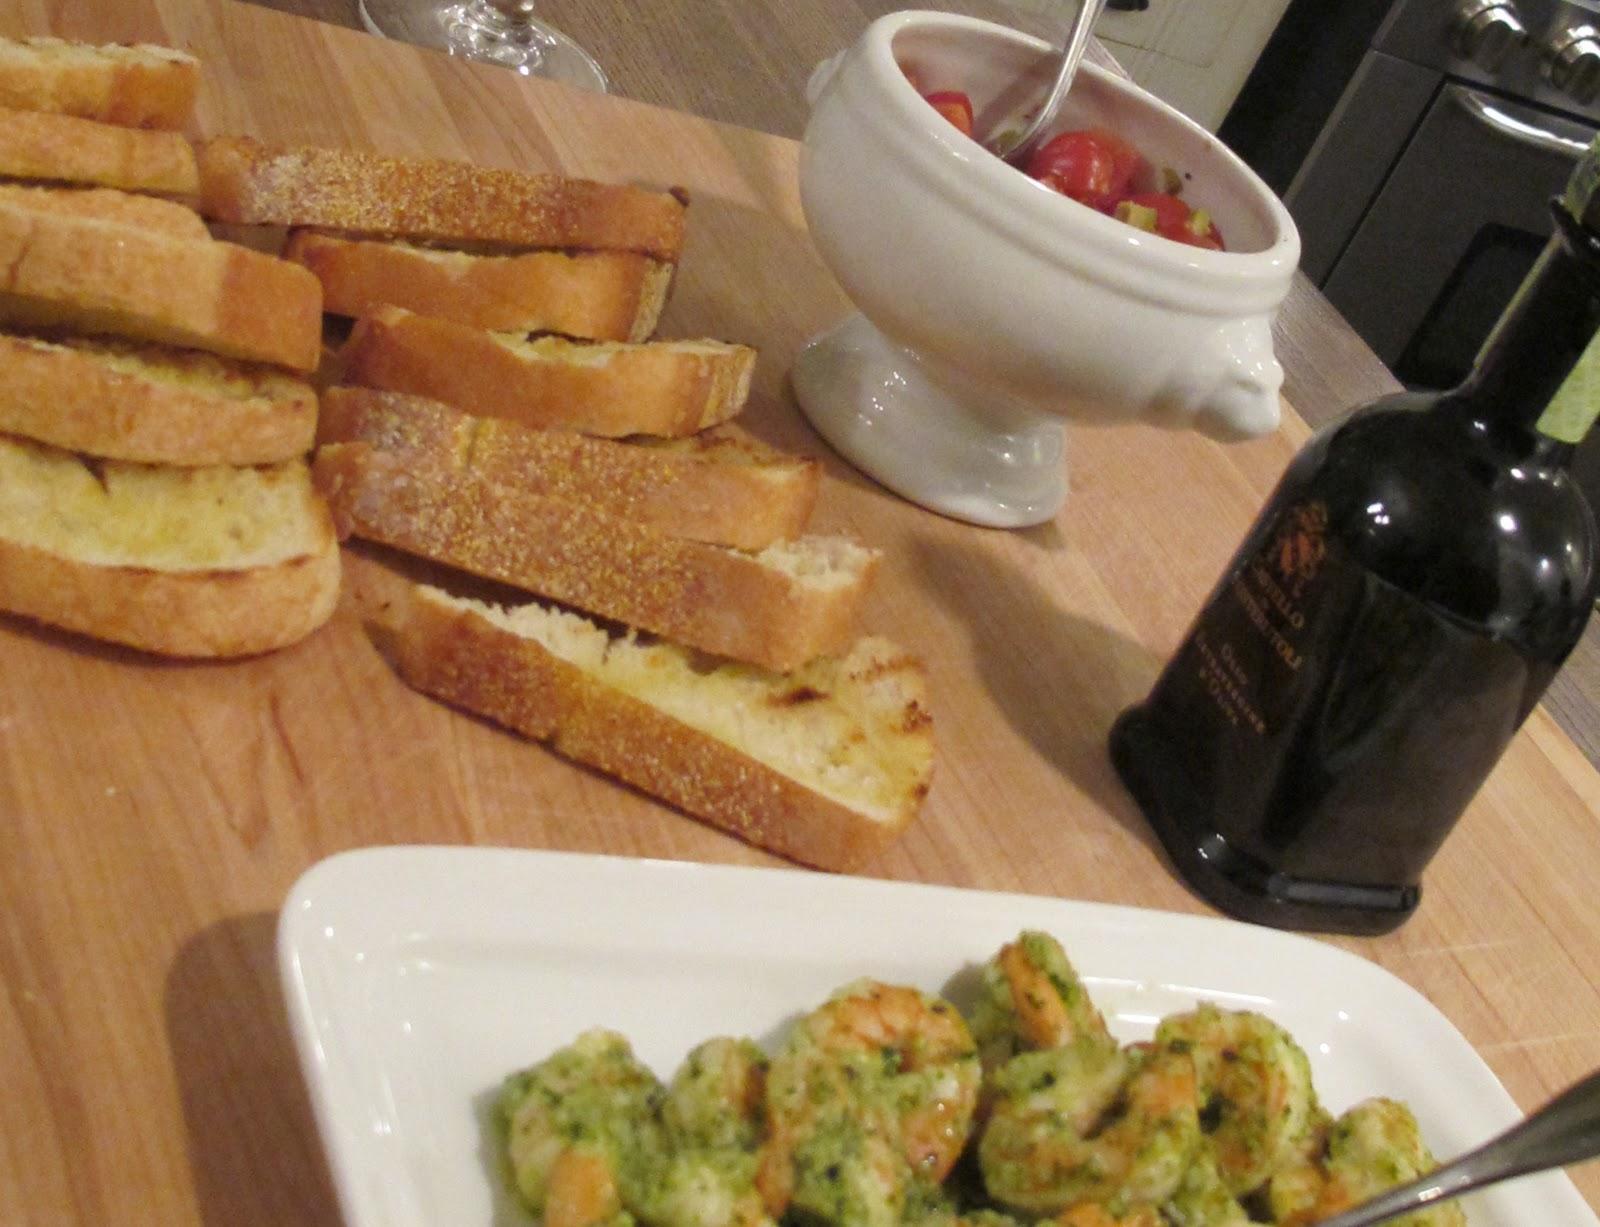 Jenny steffens hobick recipes shrimp pesto appetizer for Dinner party recipes for 12